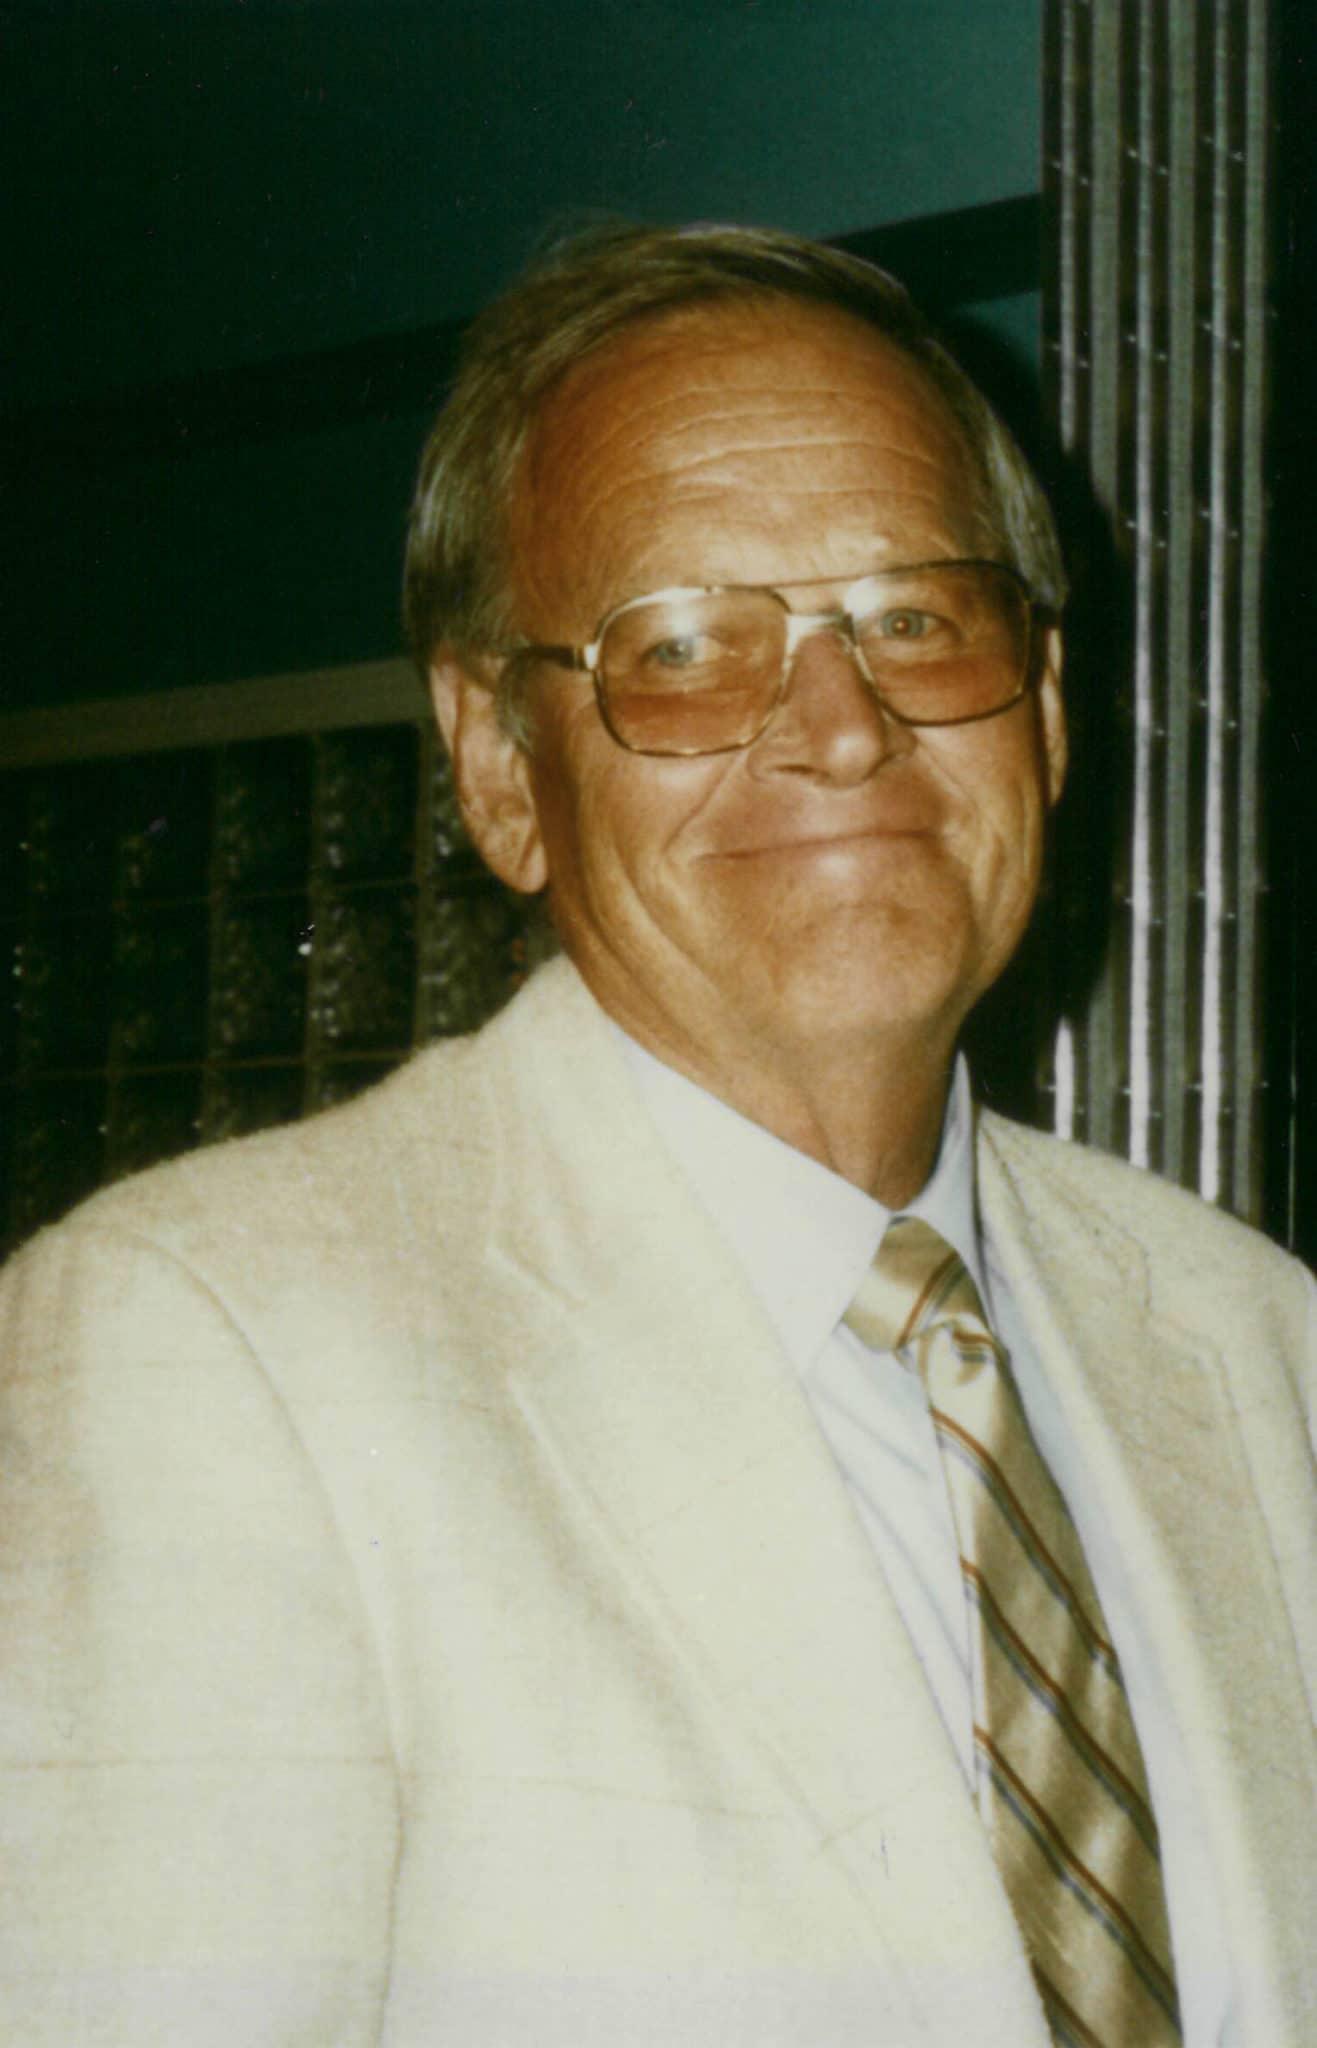 Bill Franklin